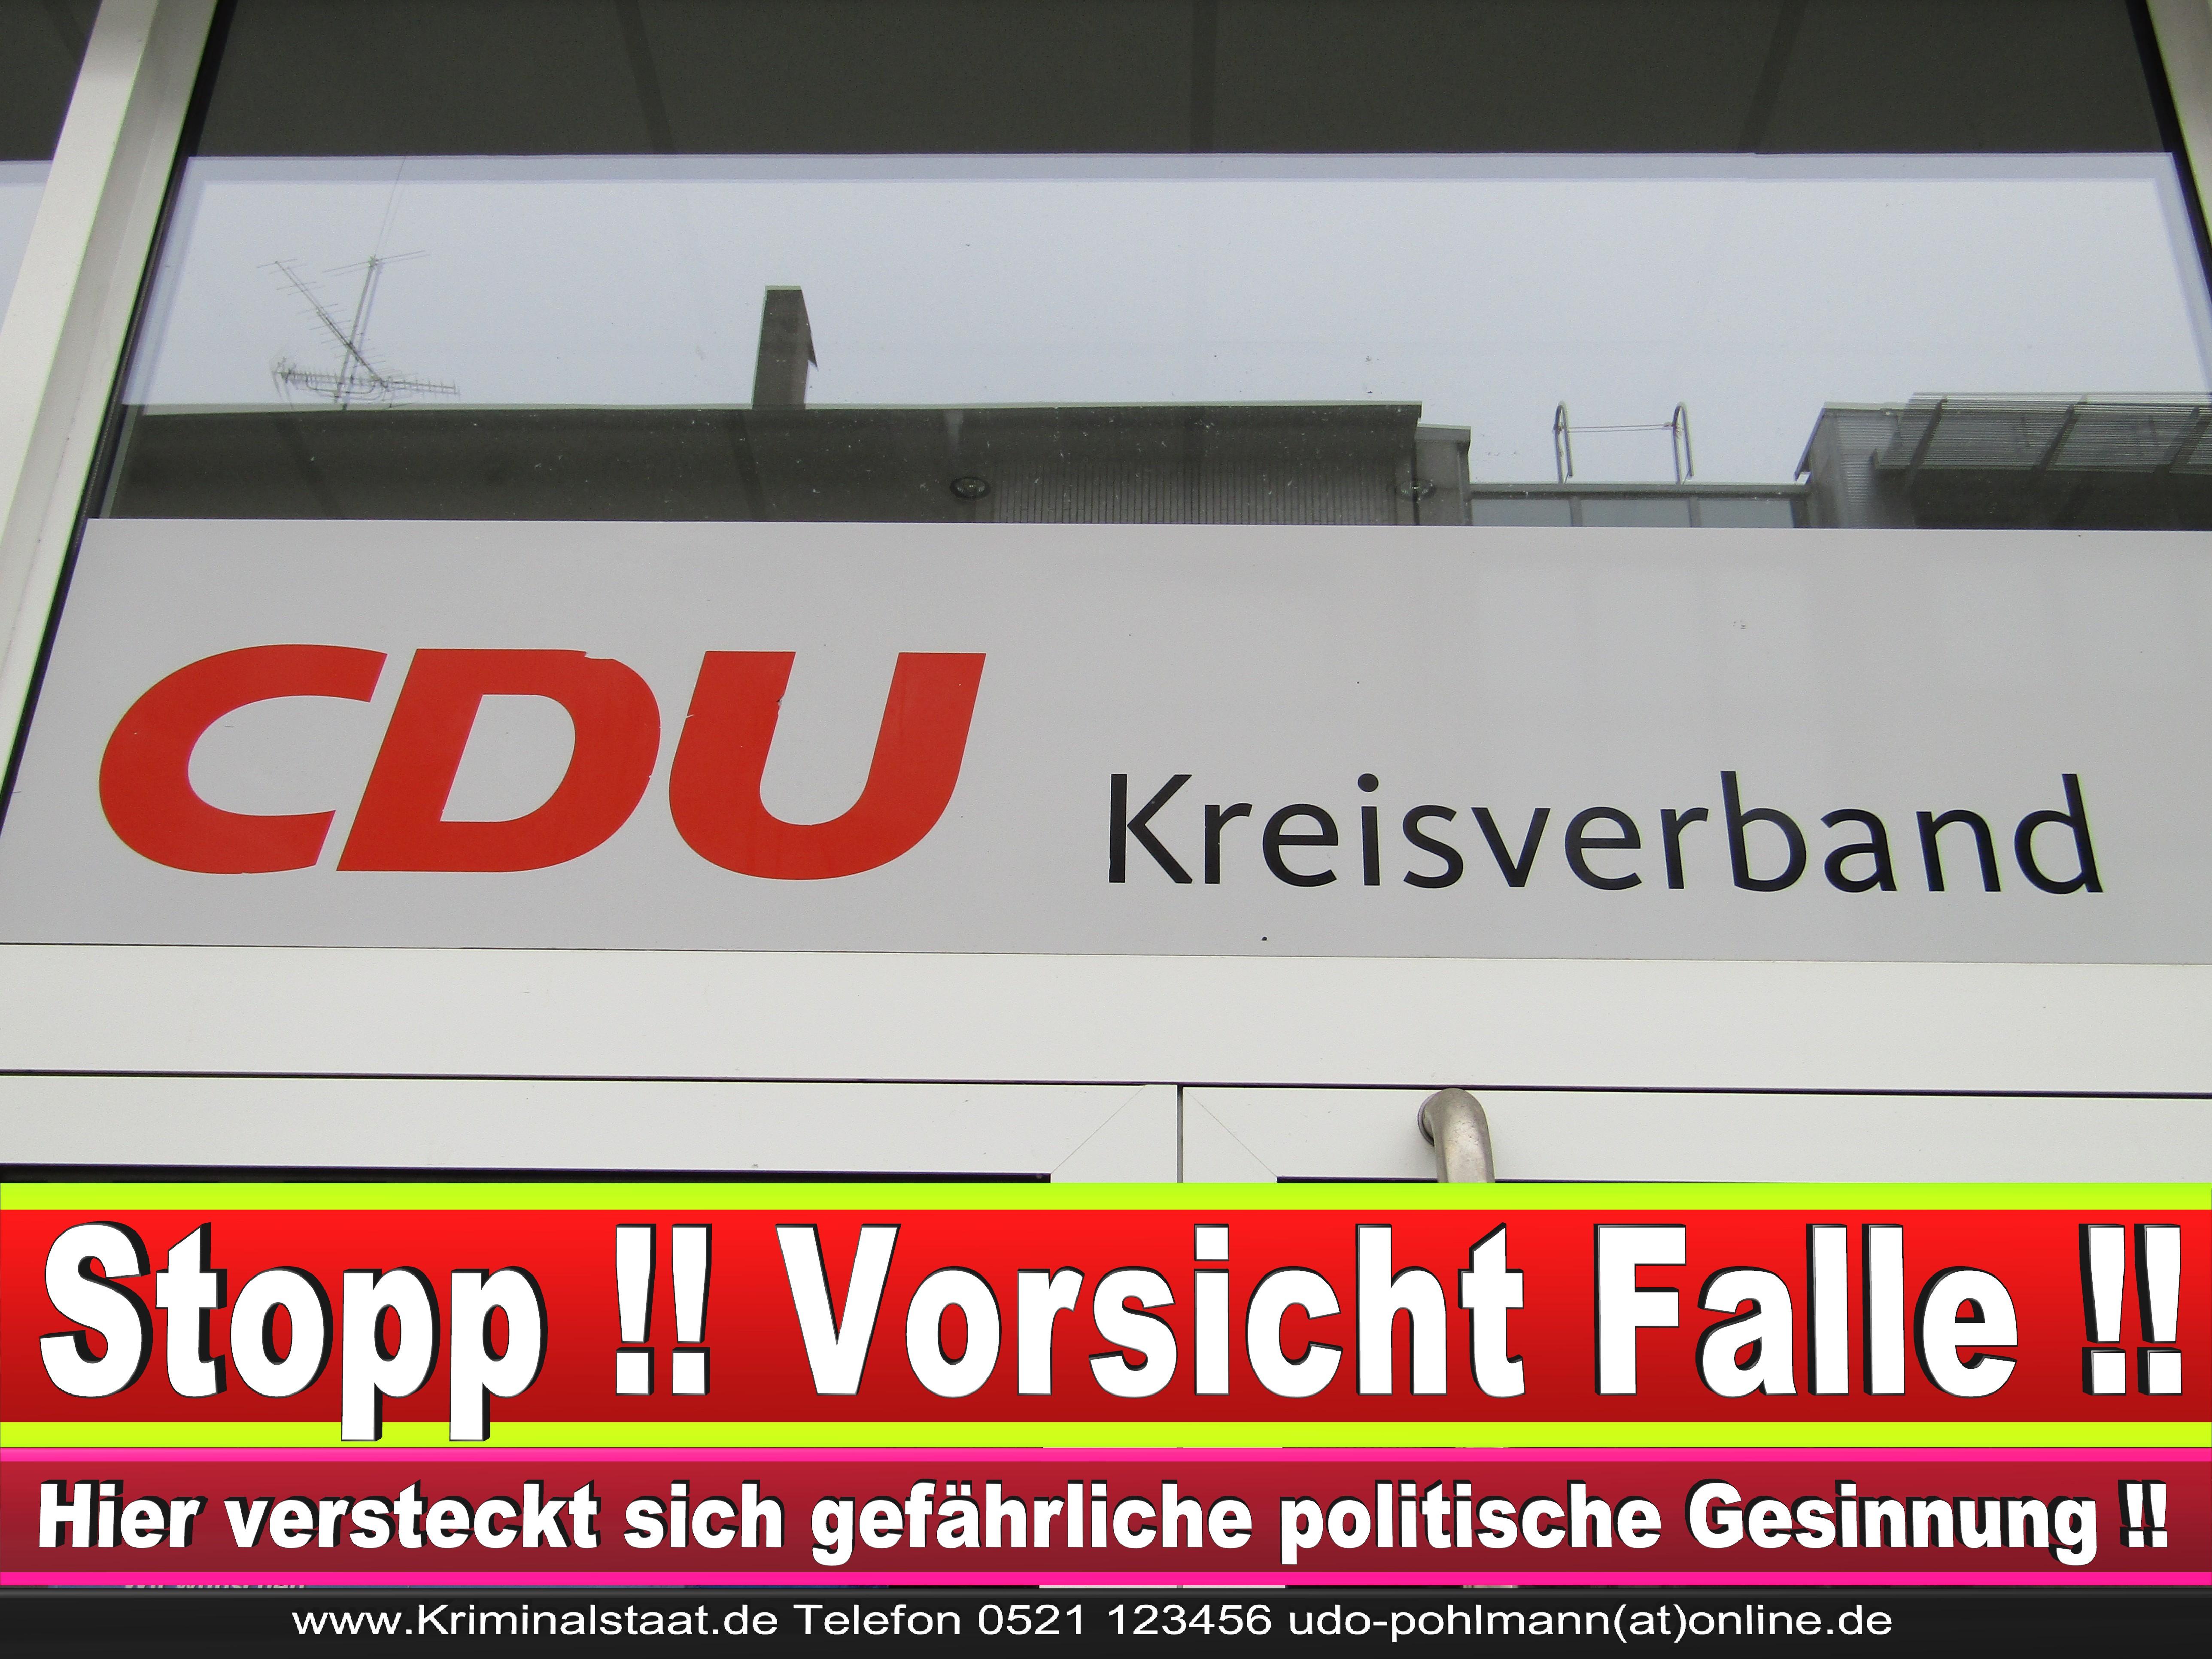 CDU DORTMUND KREISVERBAND BüRGERBüRO CDU FRAKTION ORTSVERBAND CDU NRW GESCHäFTSSTELLE ADRESSE RATSMITGLIEDER CDU (11) 1